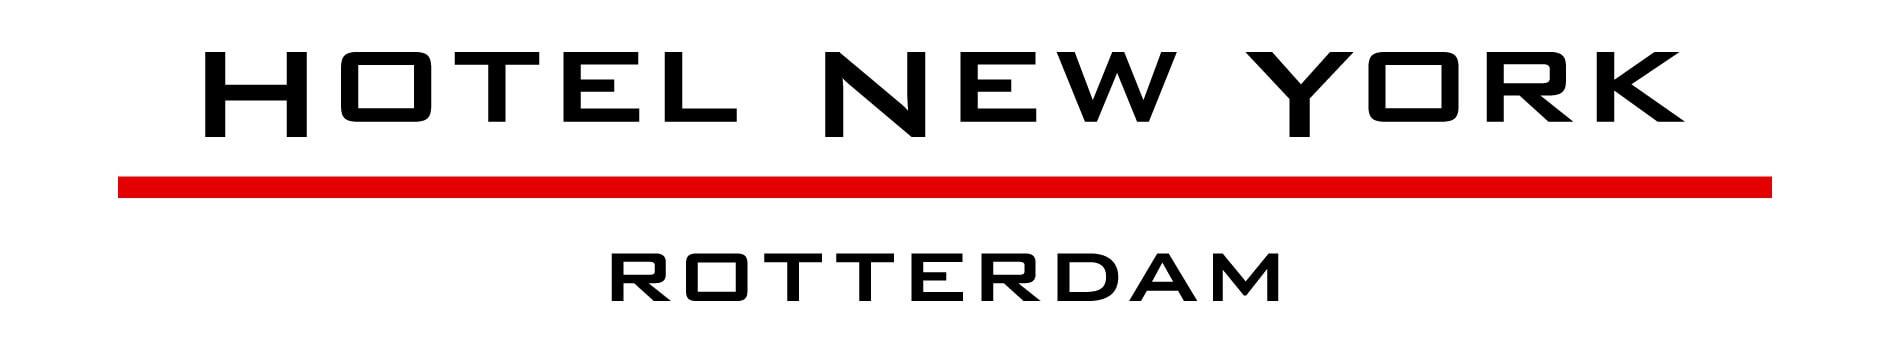 logo Hotel New York